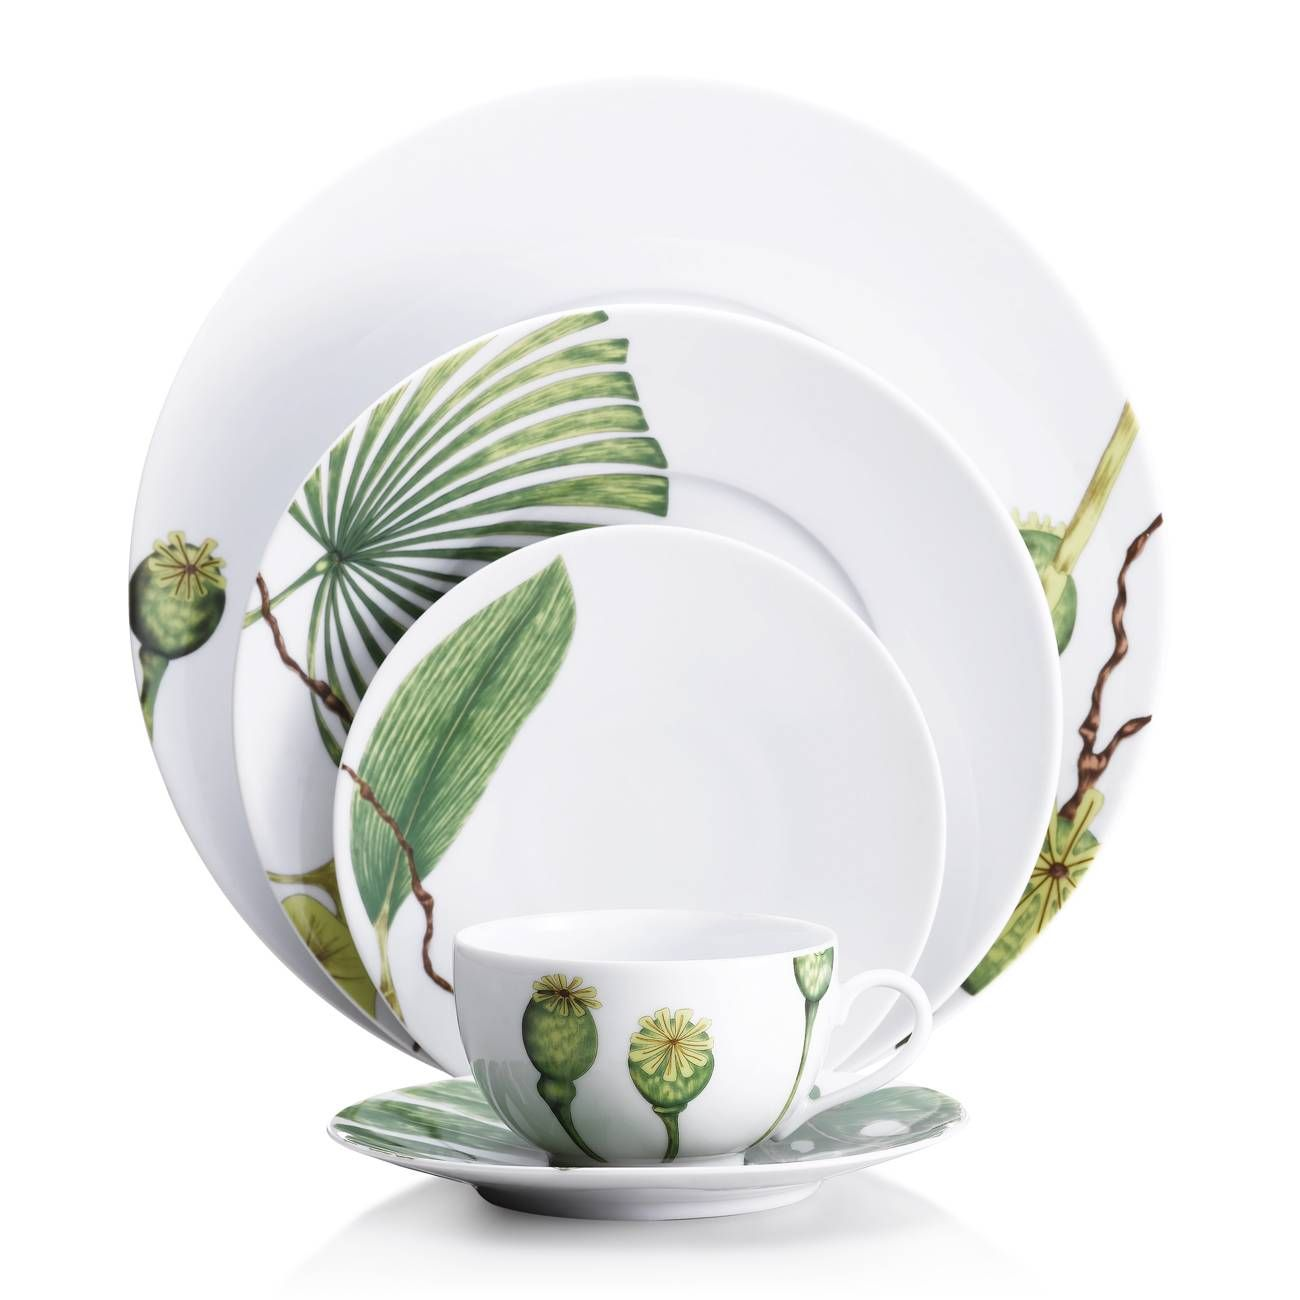 m dard de noblat ikebana dinnerware collection. Black Bedroom Furniture Sets. Home Design Ideas